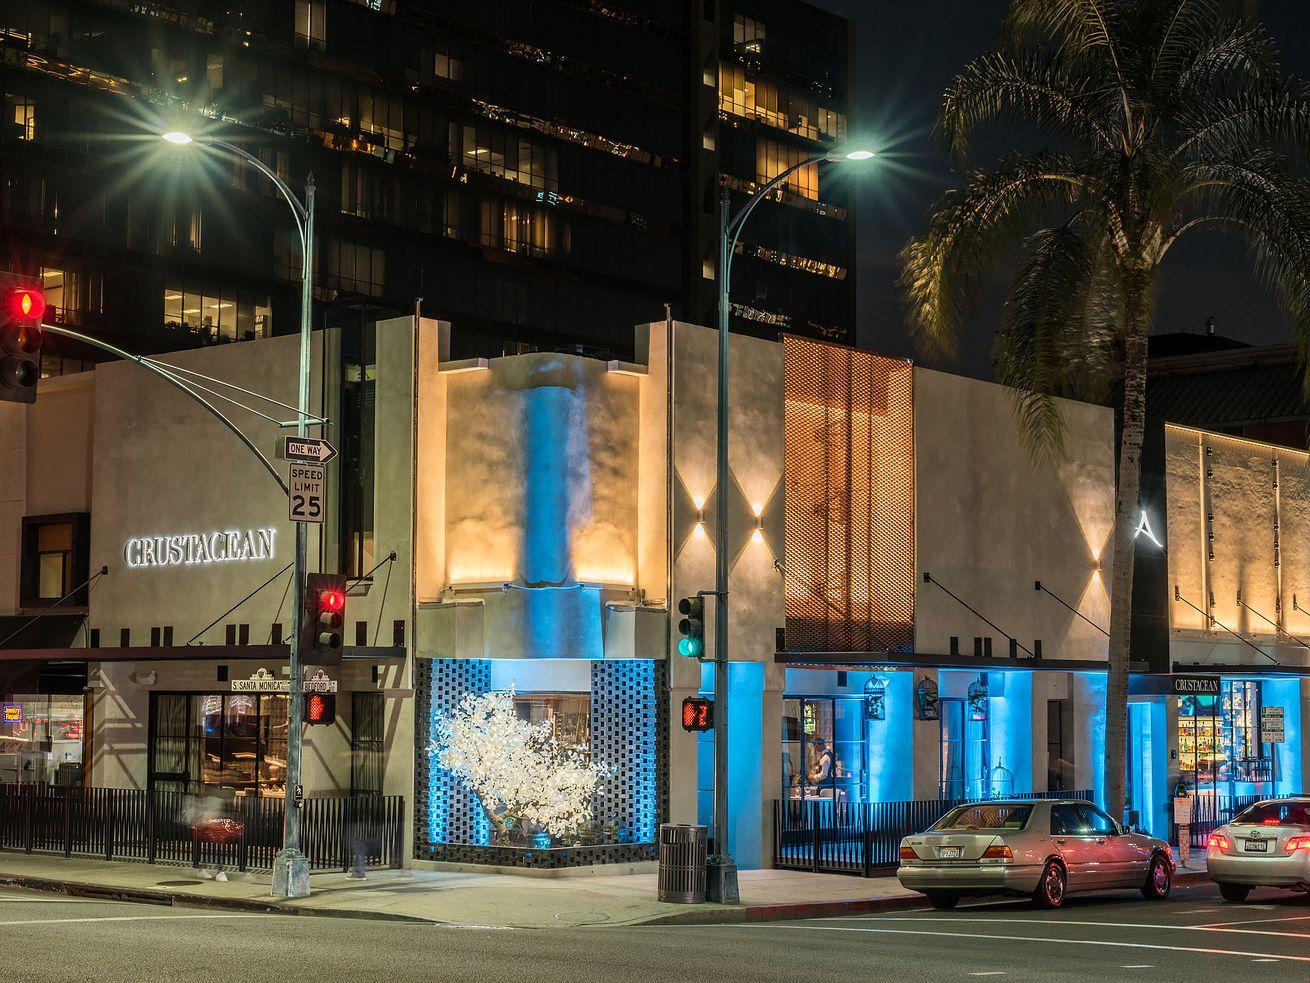 Crustacean restaurant in Beverly Hills.